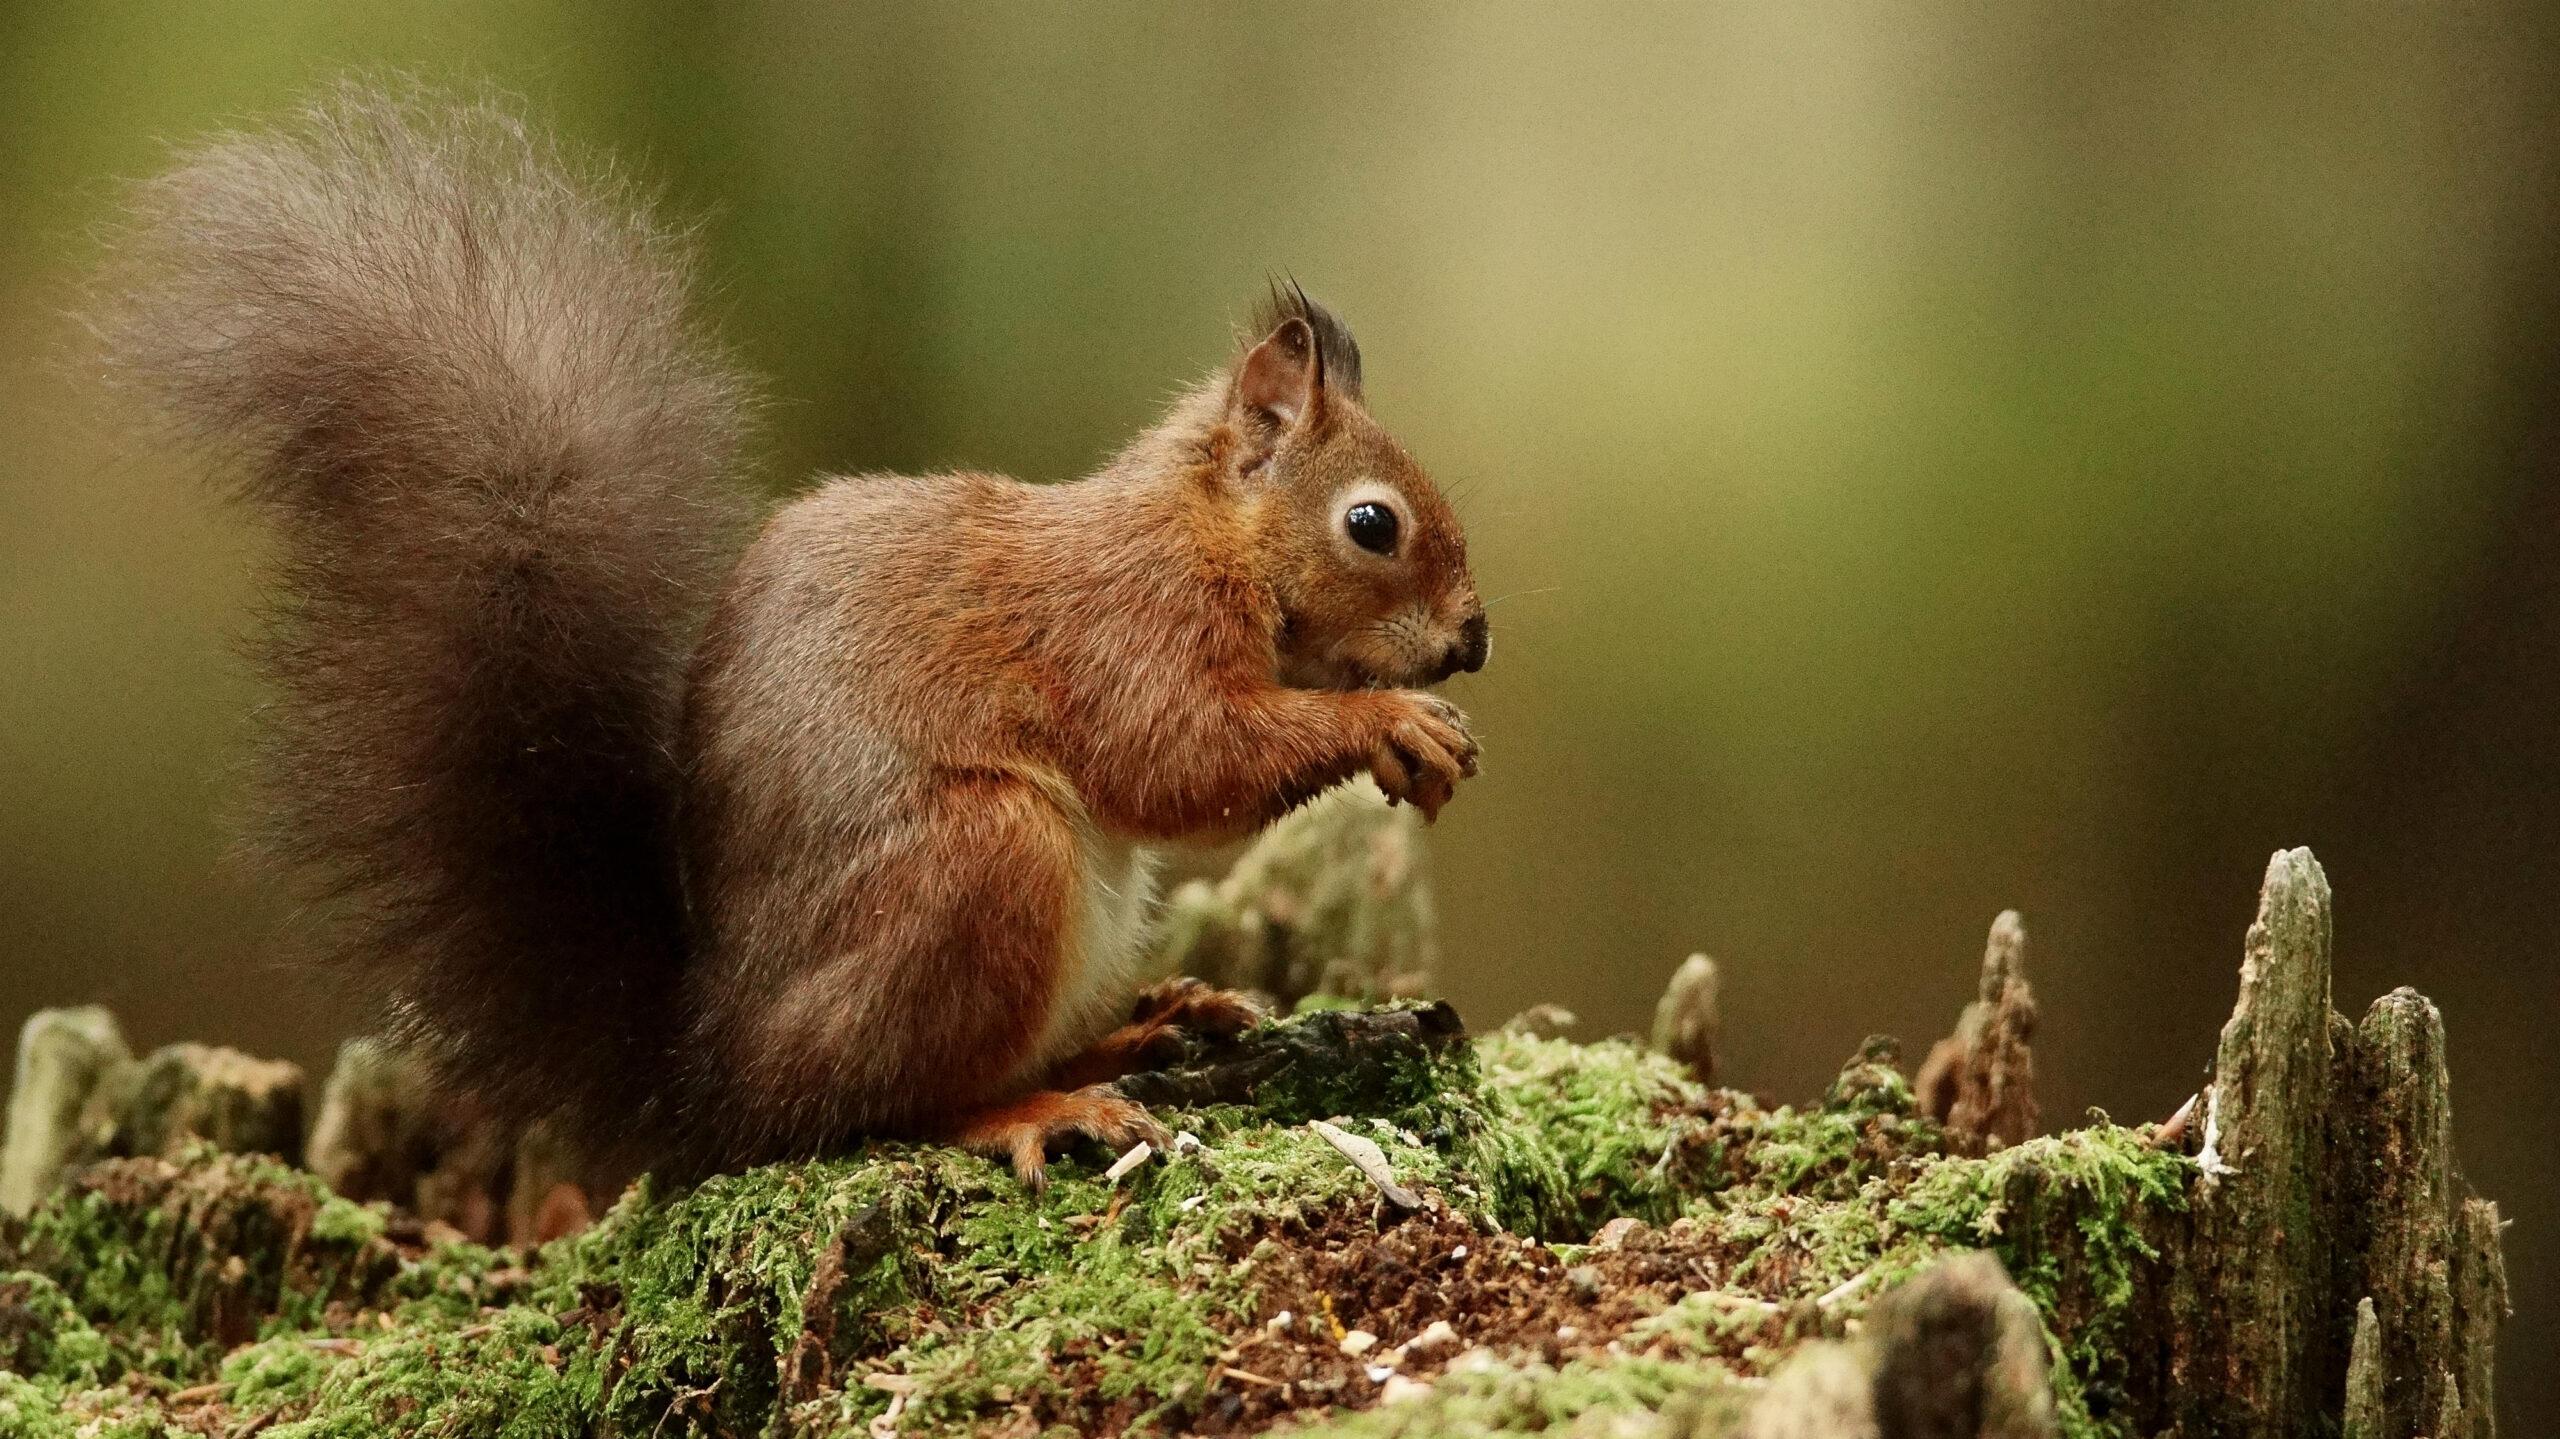 Brownsea Island Squirrel 2 | Brownsea Island